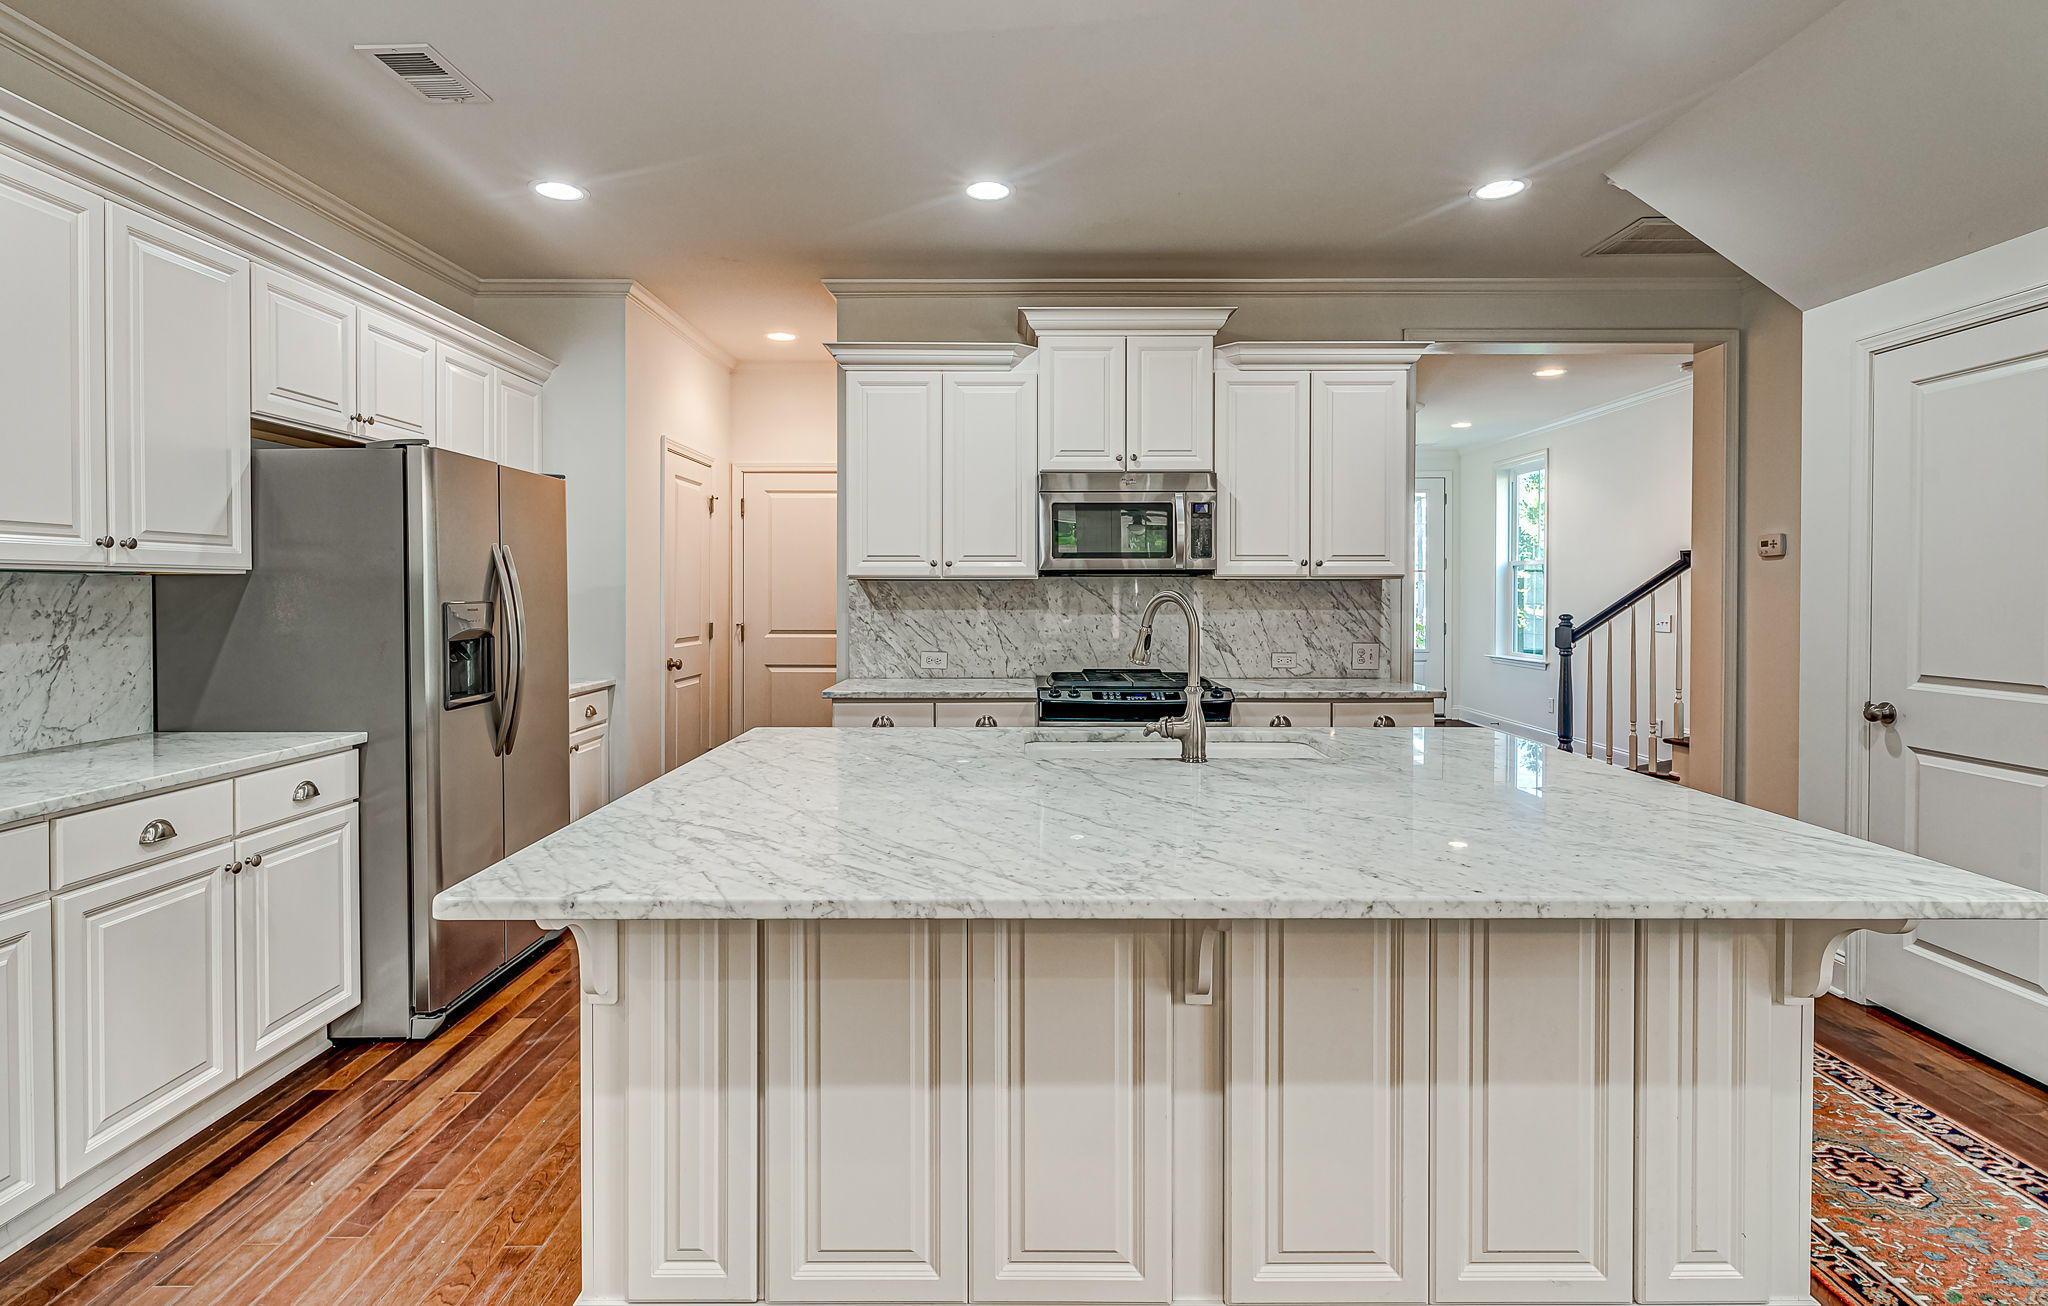 Dunes West Homes For Sale - 2476 Kings Gate, Mount Pleasant, SC - 48